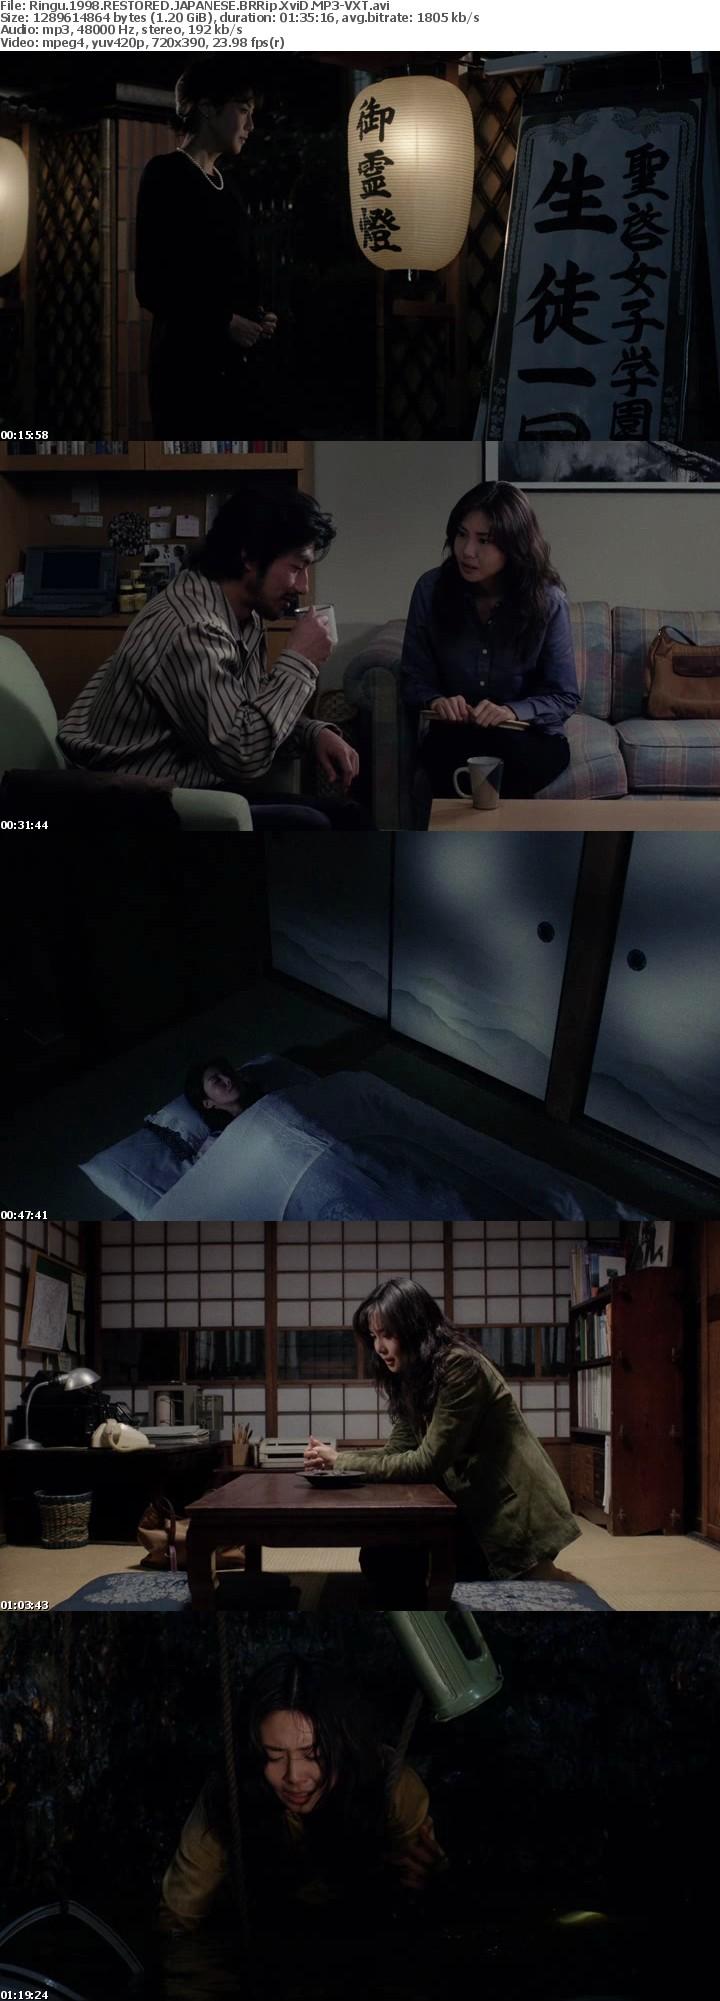 Ringu 1998 RESTORED JAPANESE BRRip XviD MP3-VXT